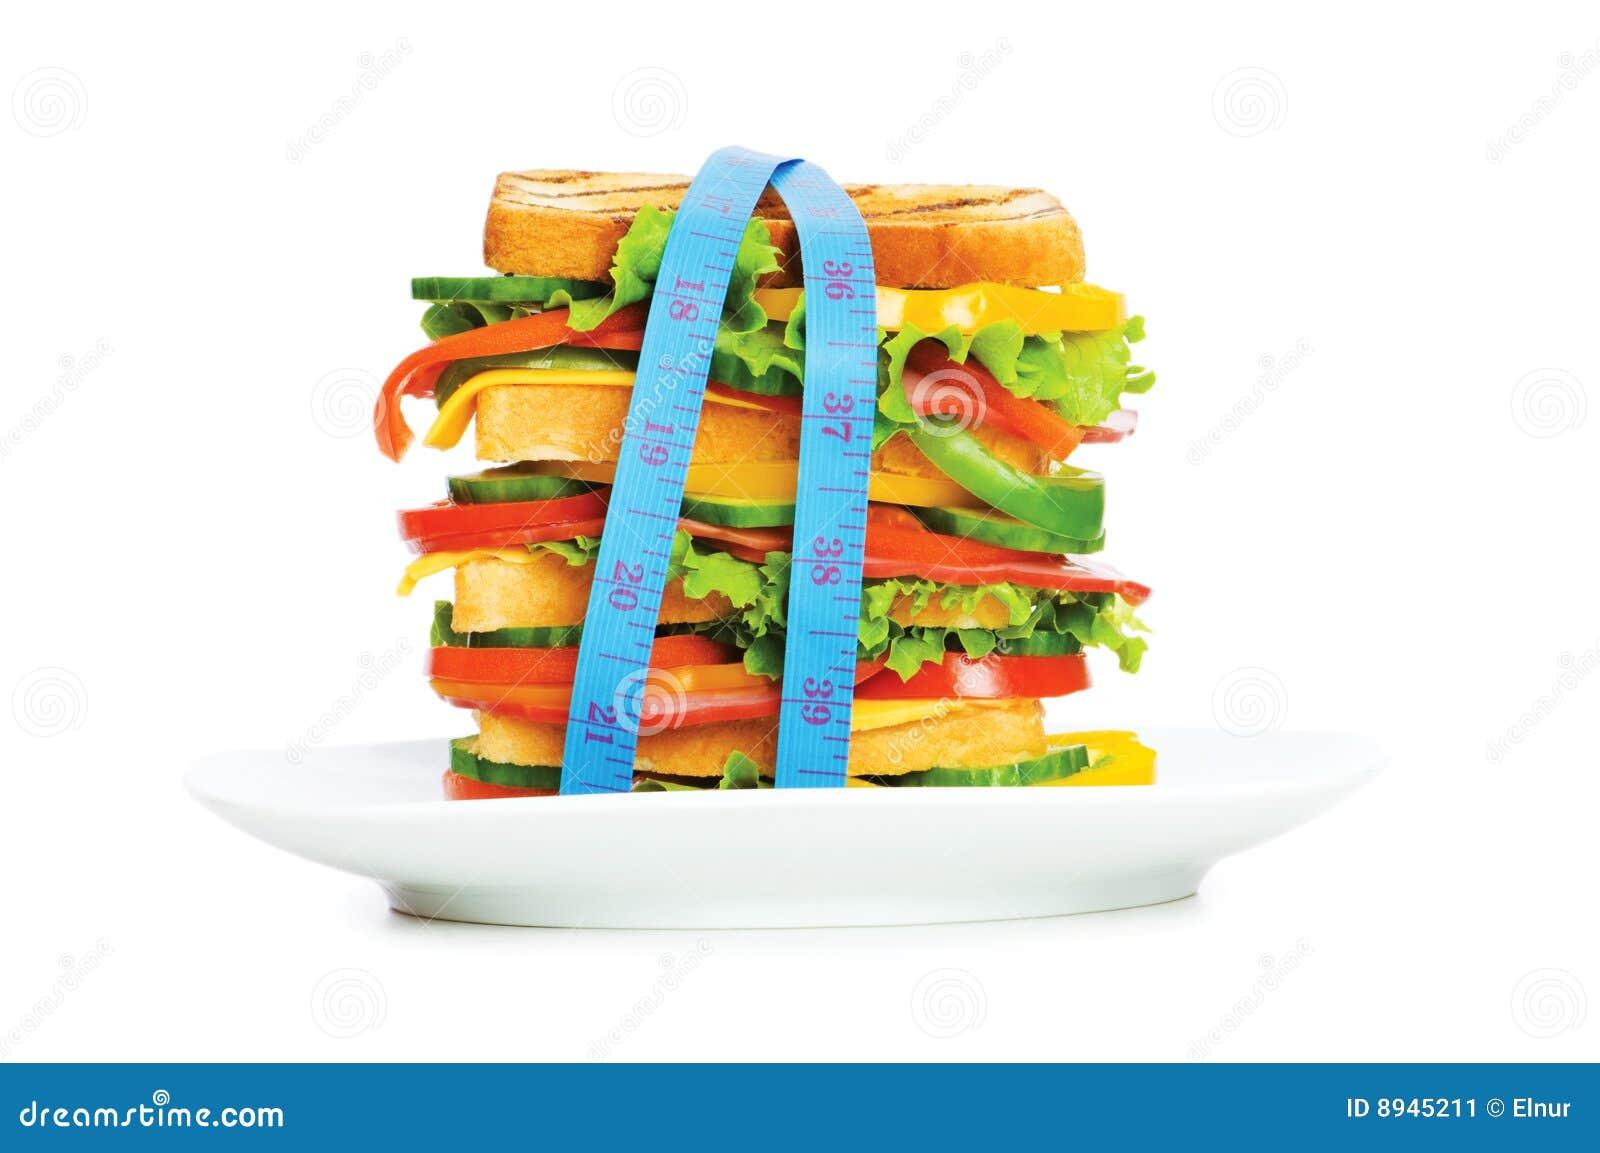 Concept of healthy food